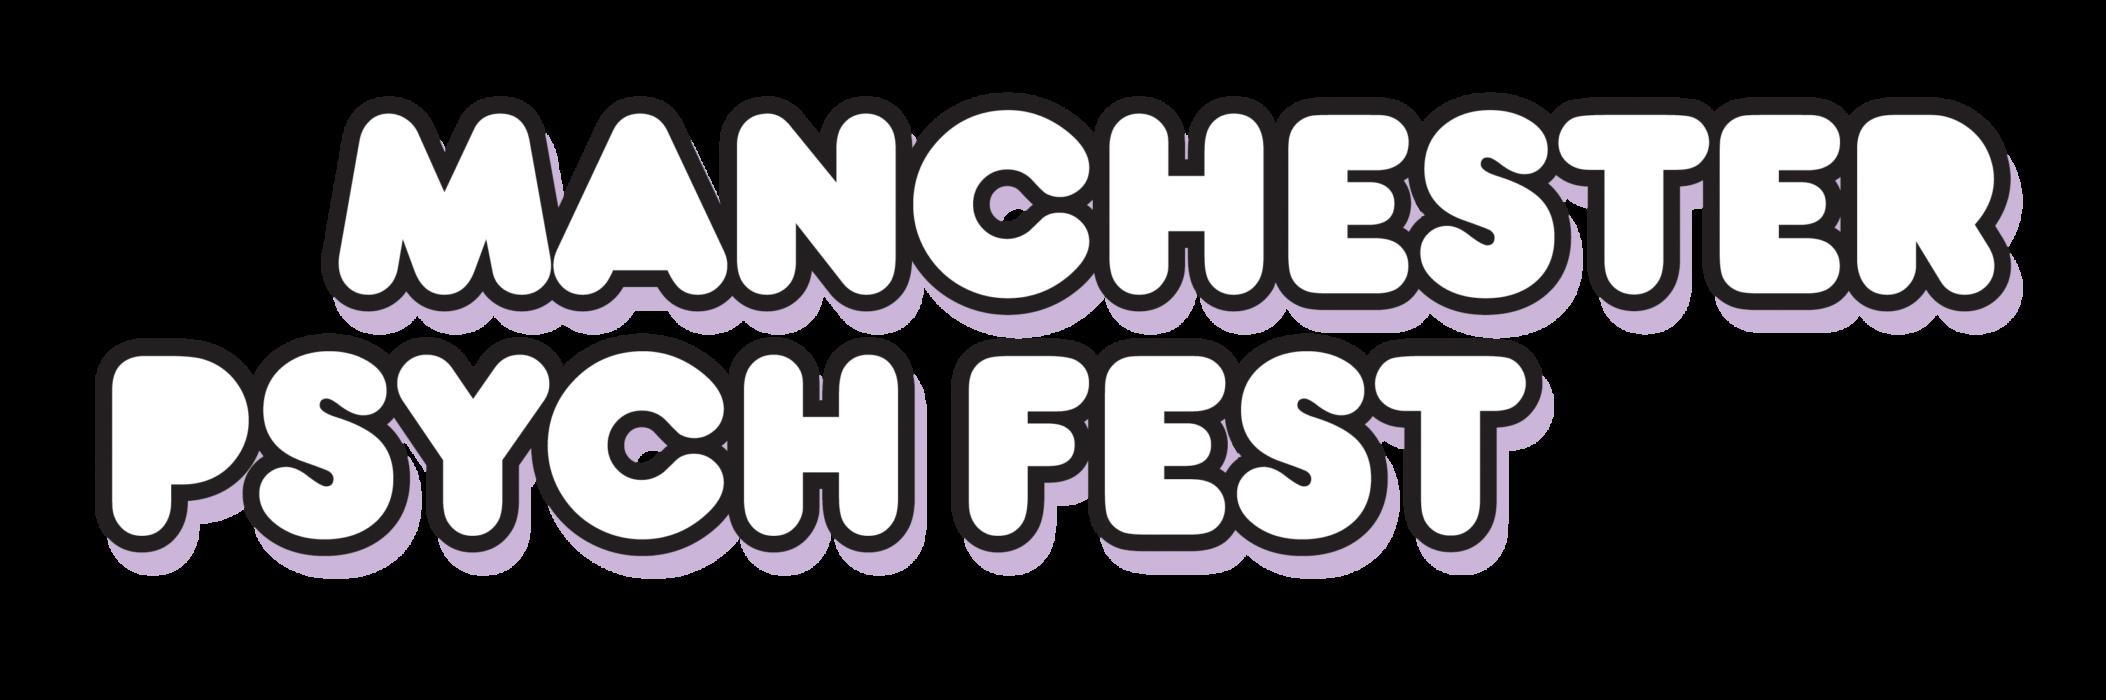 Manchester Psych Fest